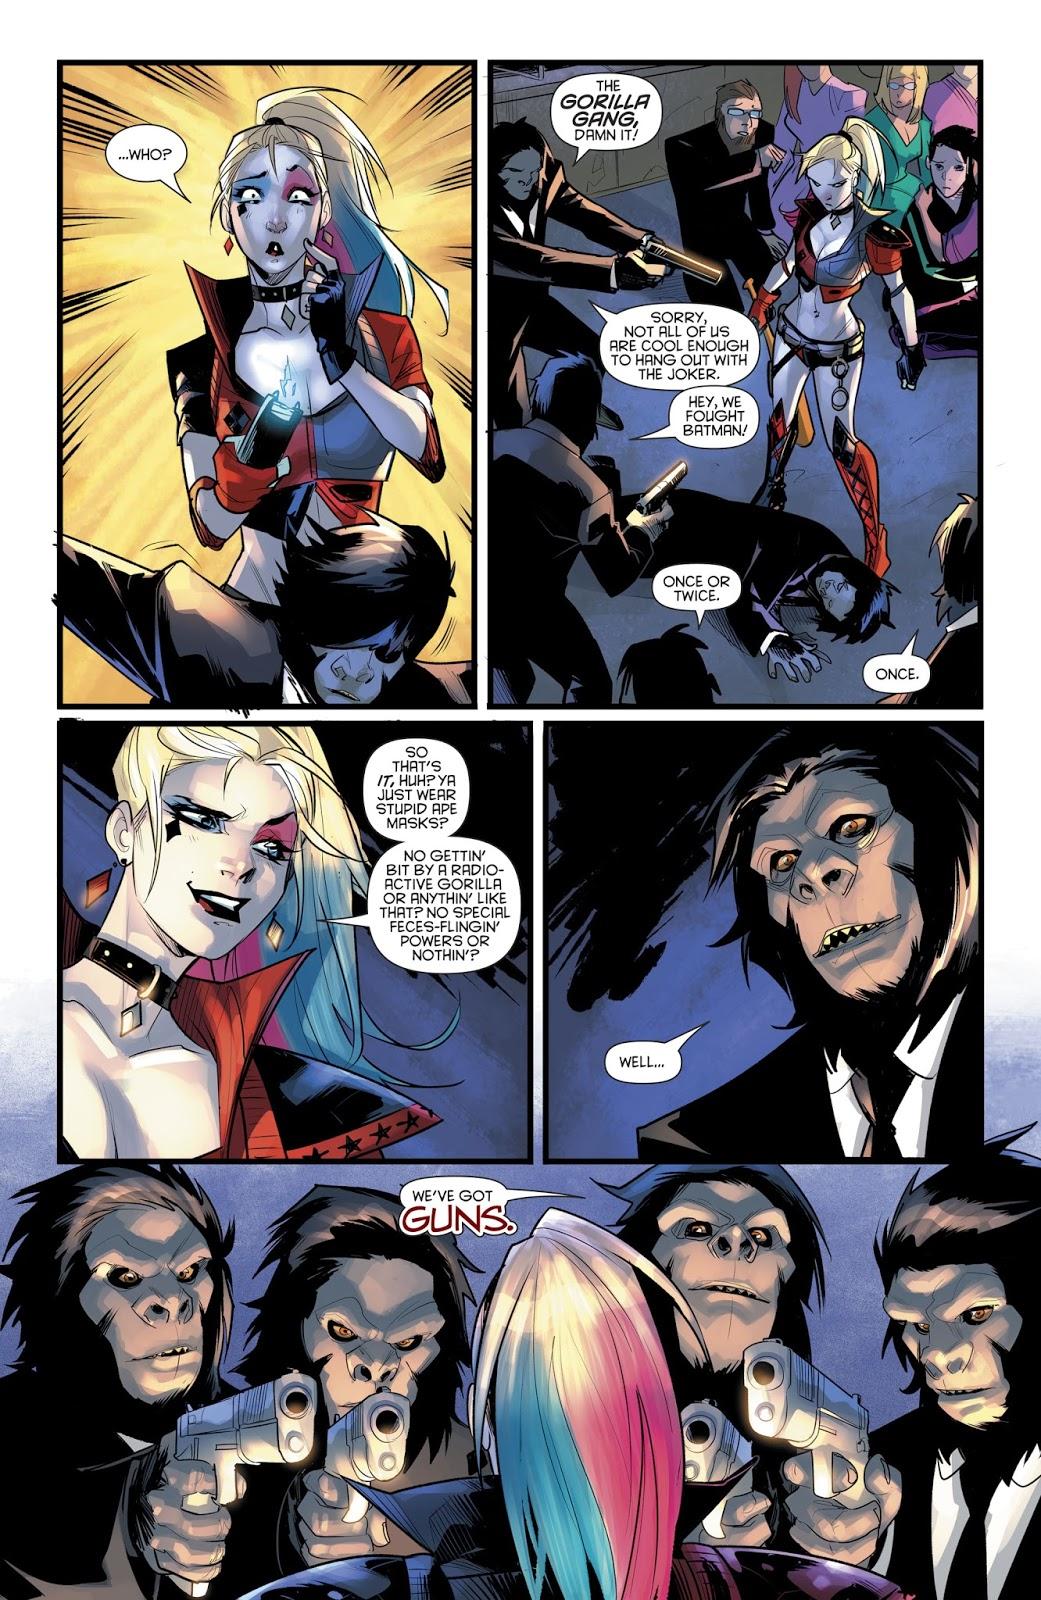 Harley Quinn VS The Gorilla Gang